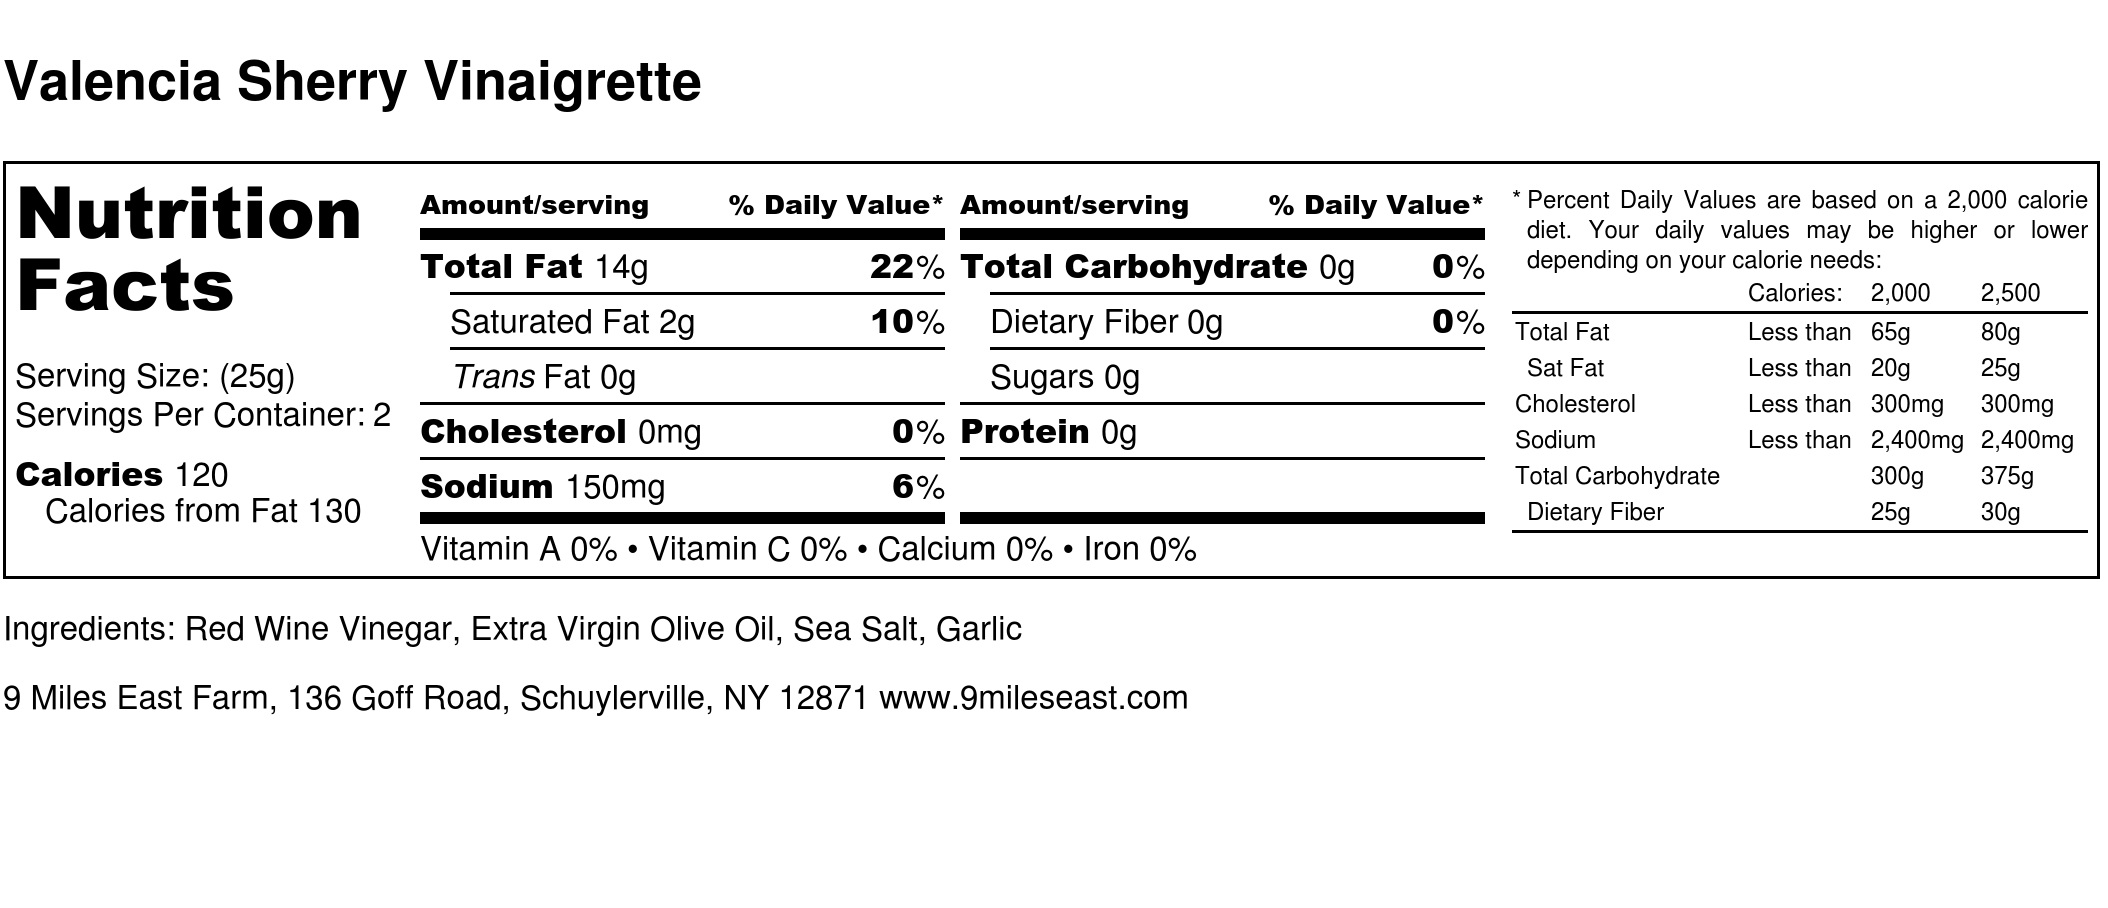 Valencia Sherry Vinaigrette - Nutrition Label.jpg